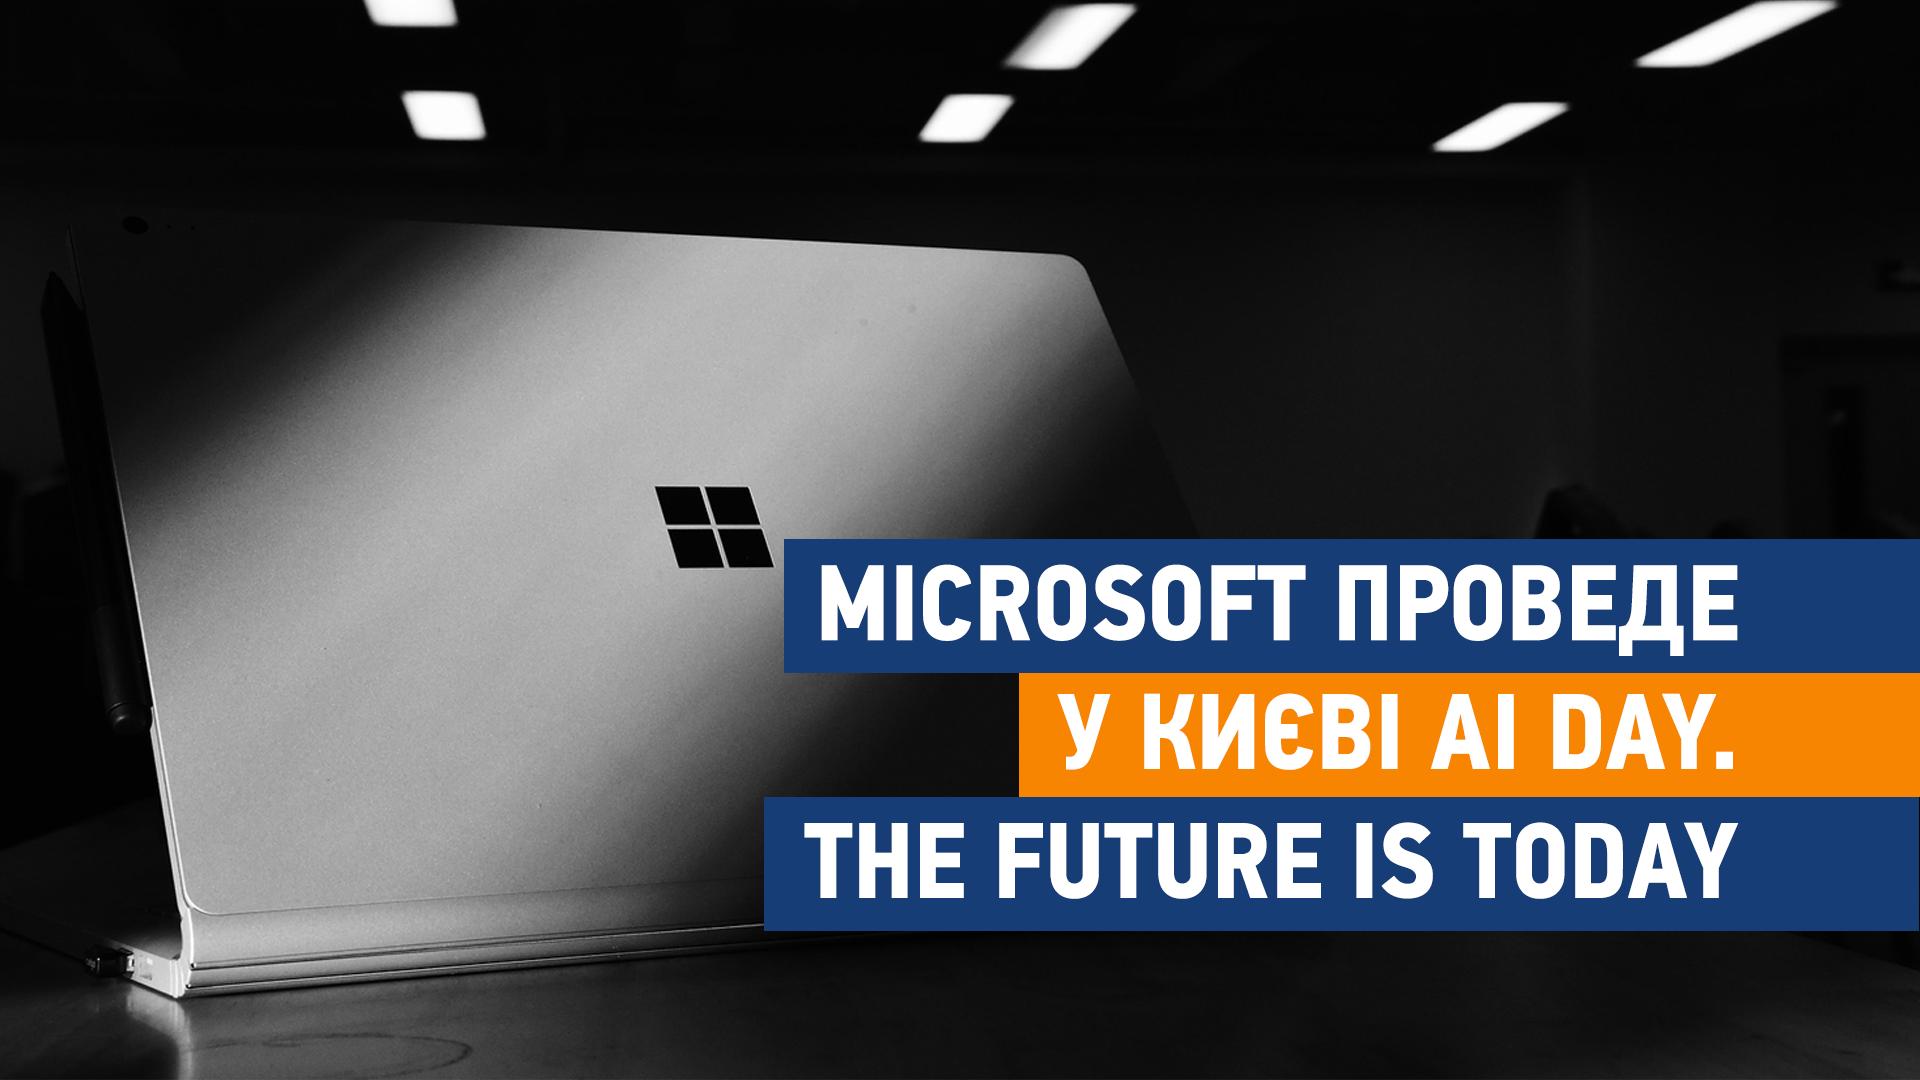 Microsoft проведе у Києві AI Day. The Future is Today - ШІ, Microsoft, AI - AI poglyad